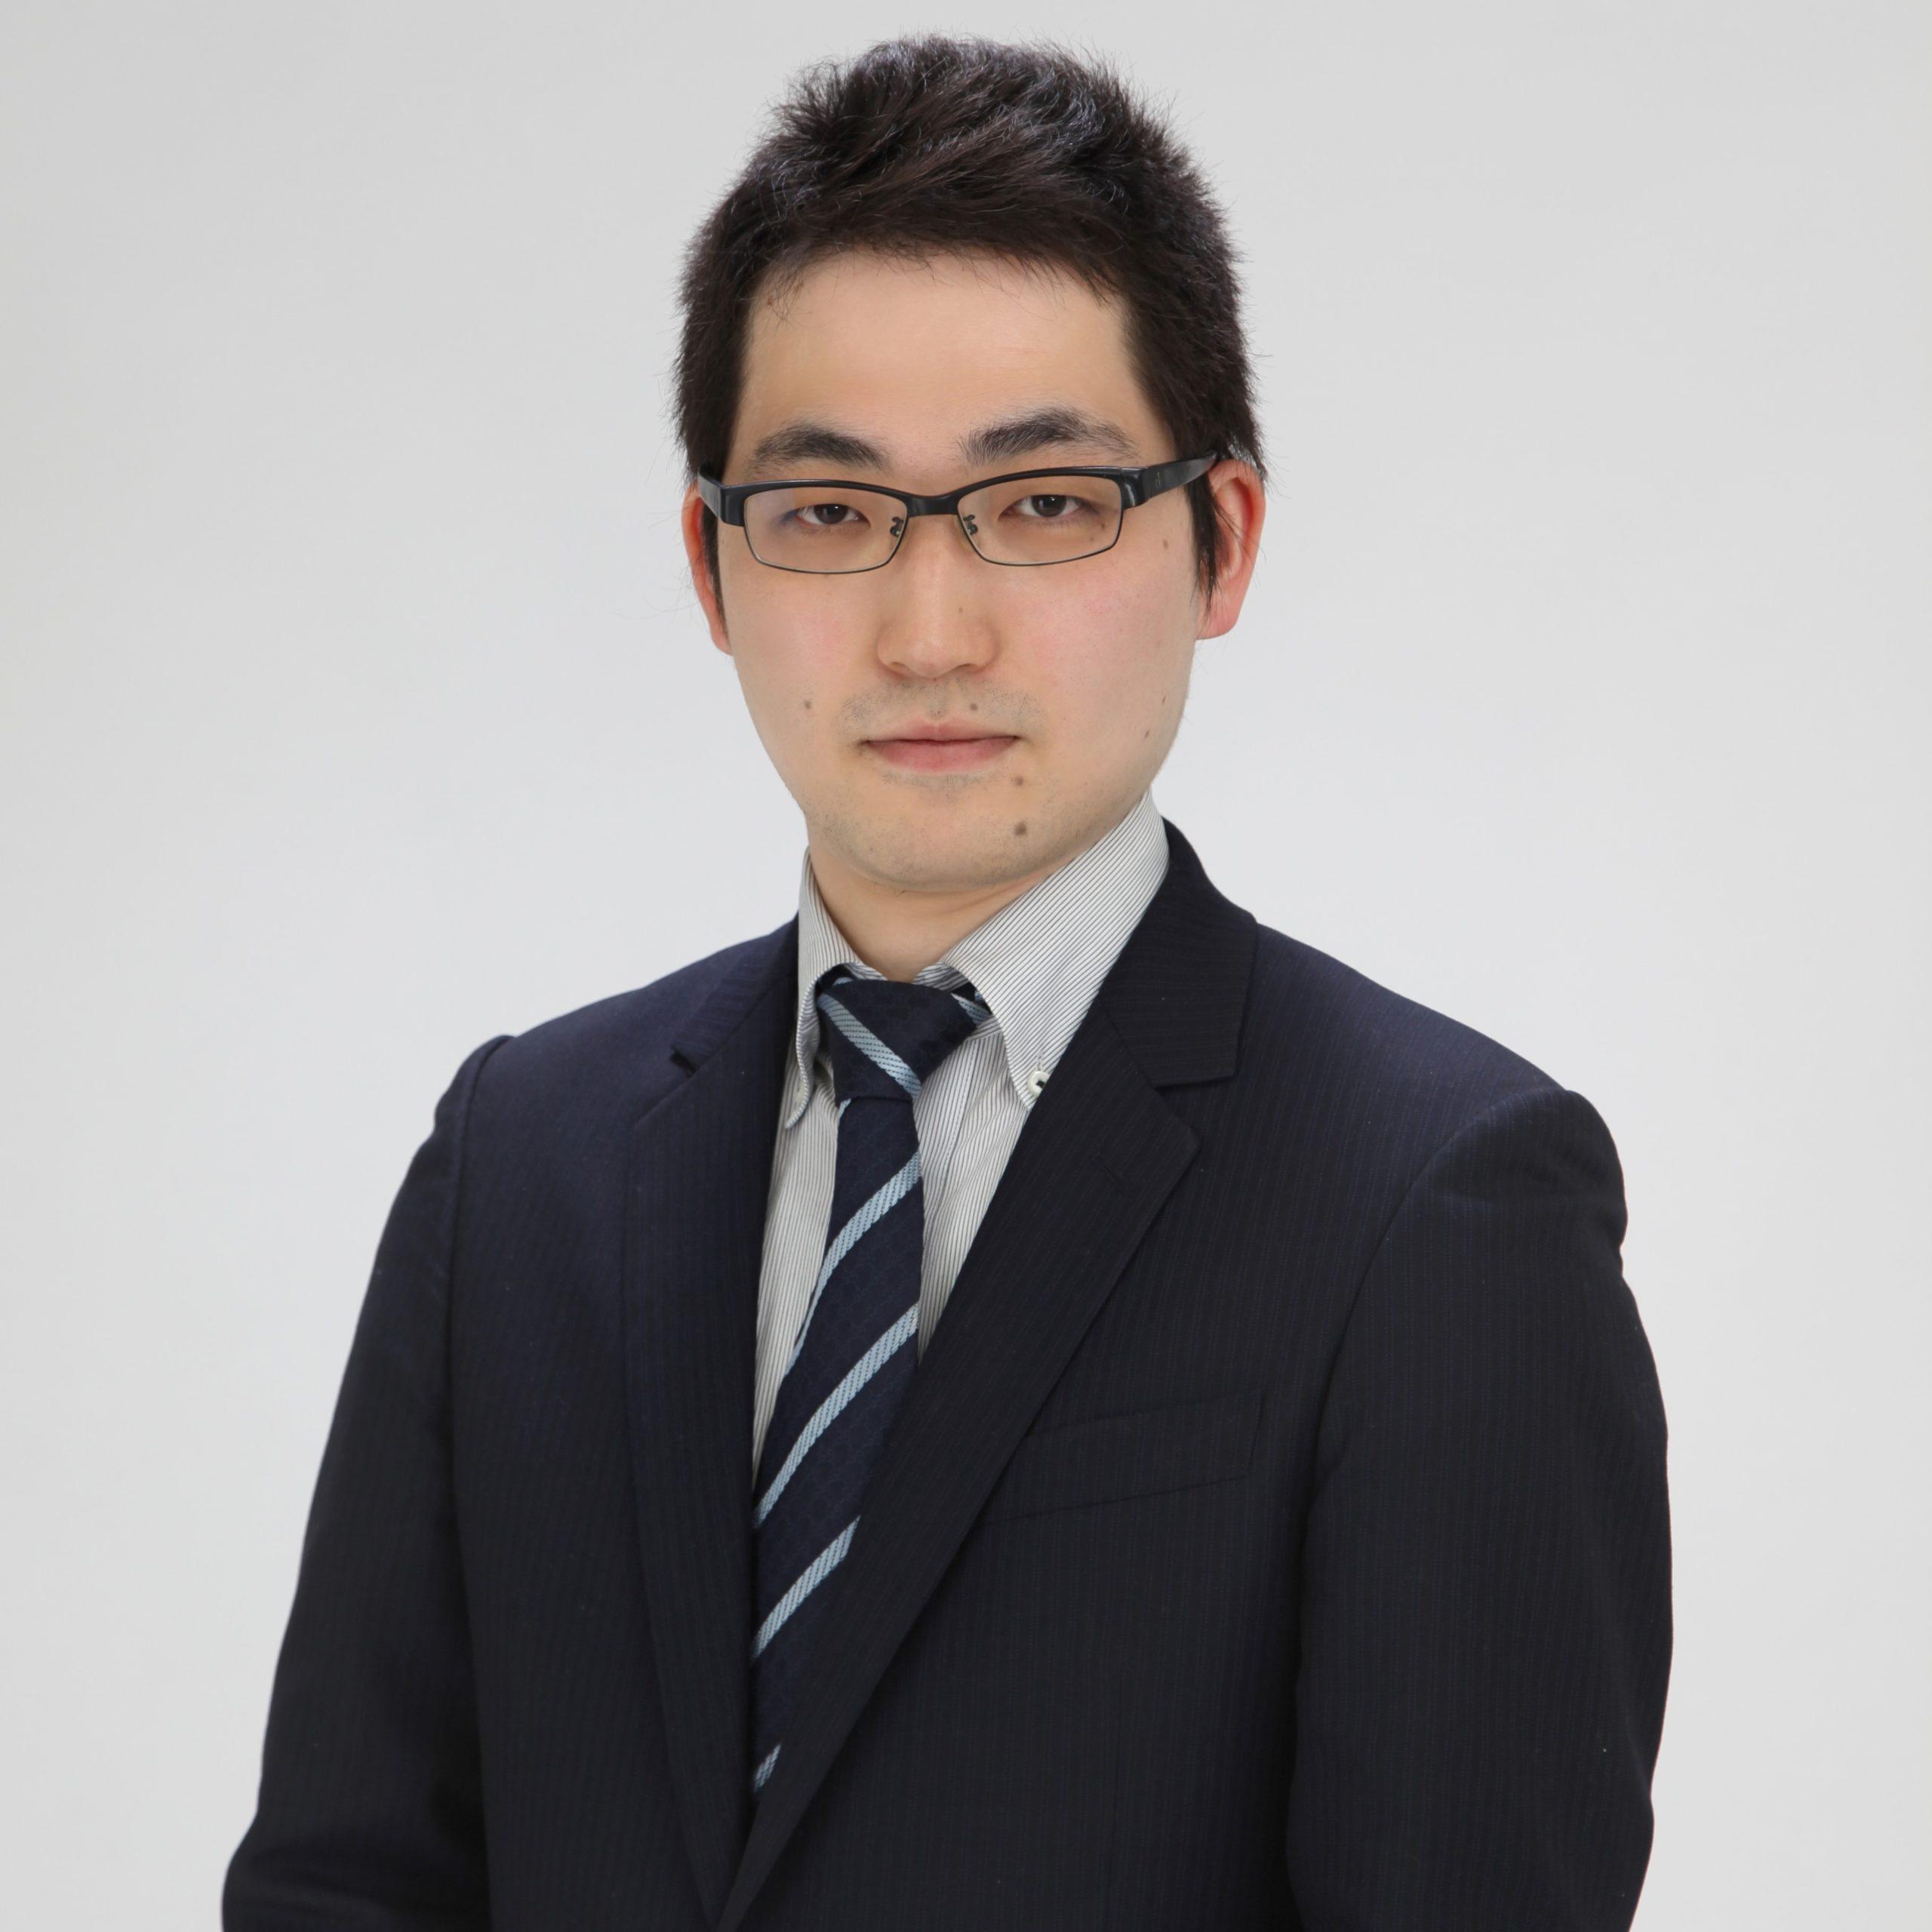 SDGsを活用した経営の実践セミナー講師 株式会社KI Strategy 代表取締役 今井 健太郎